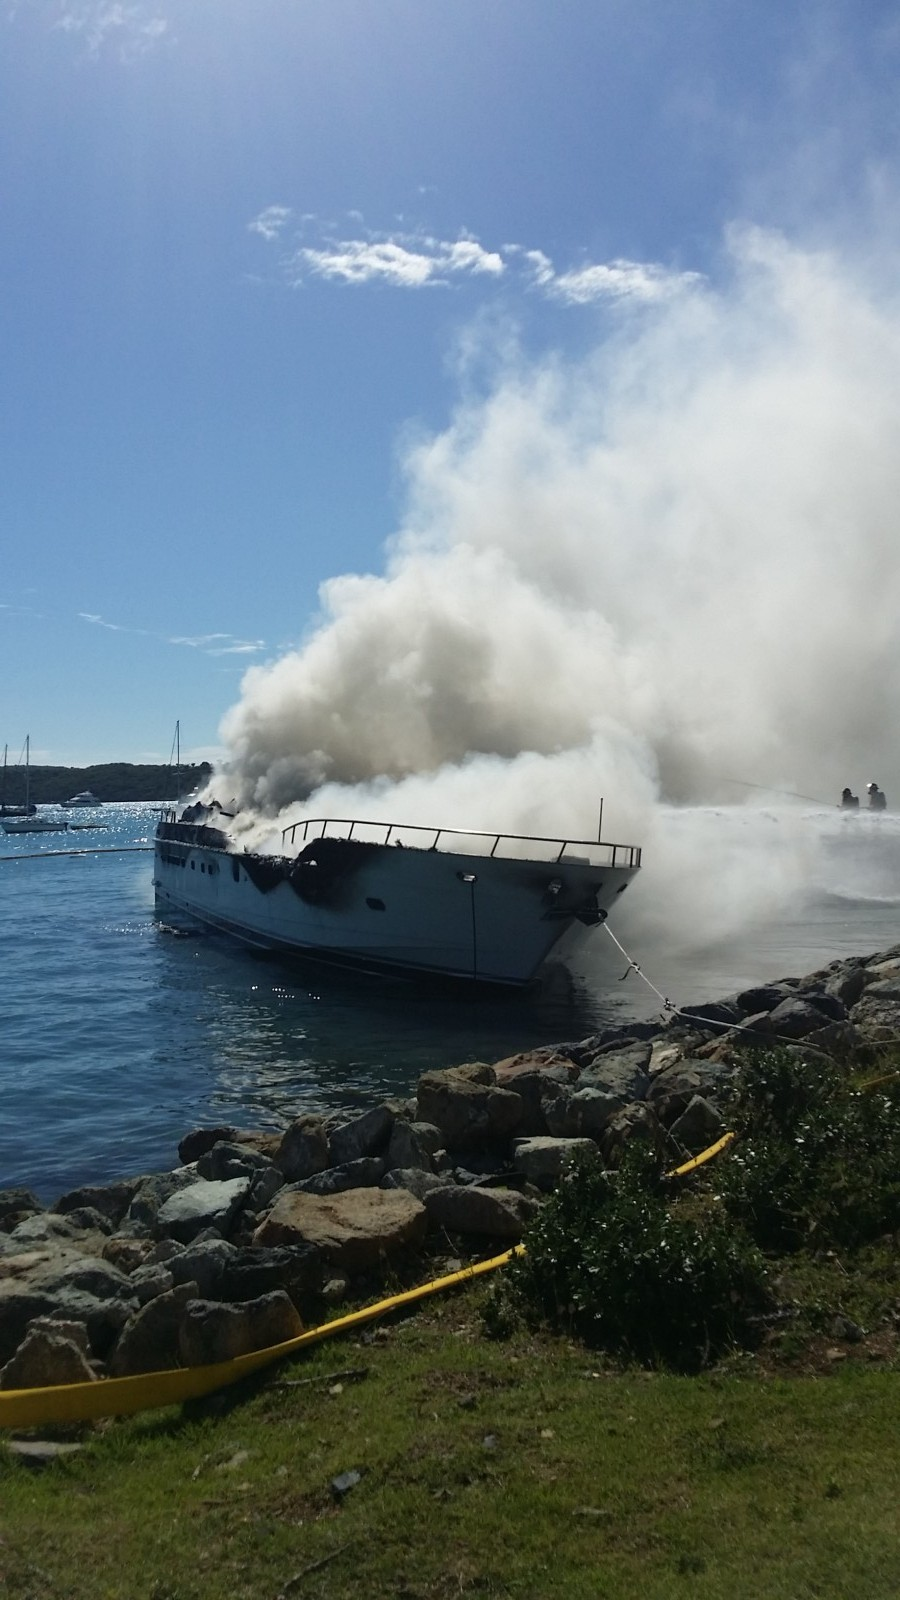 Yacht Haven Grande fire Dean Barnes photo credit (7)